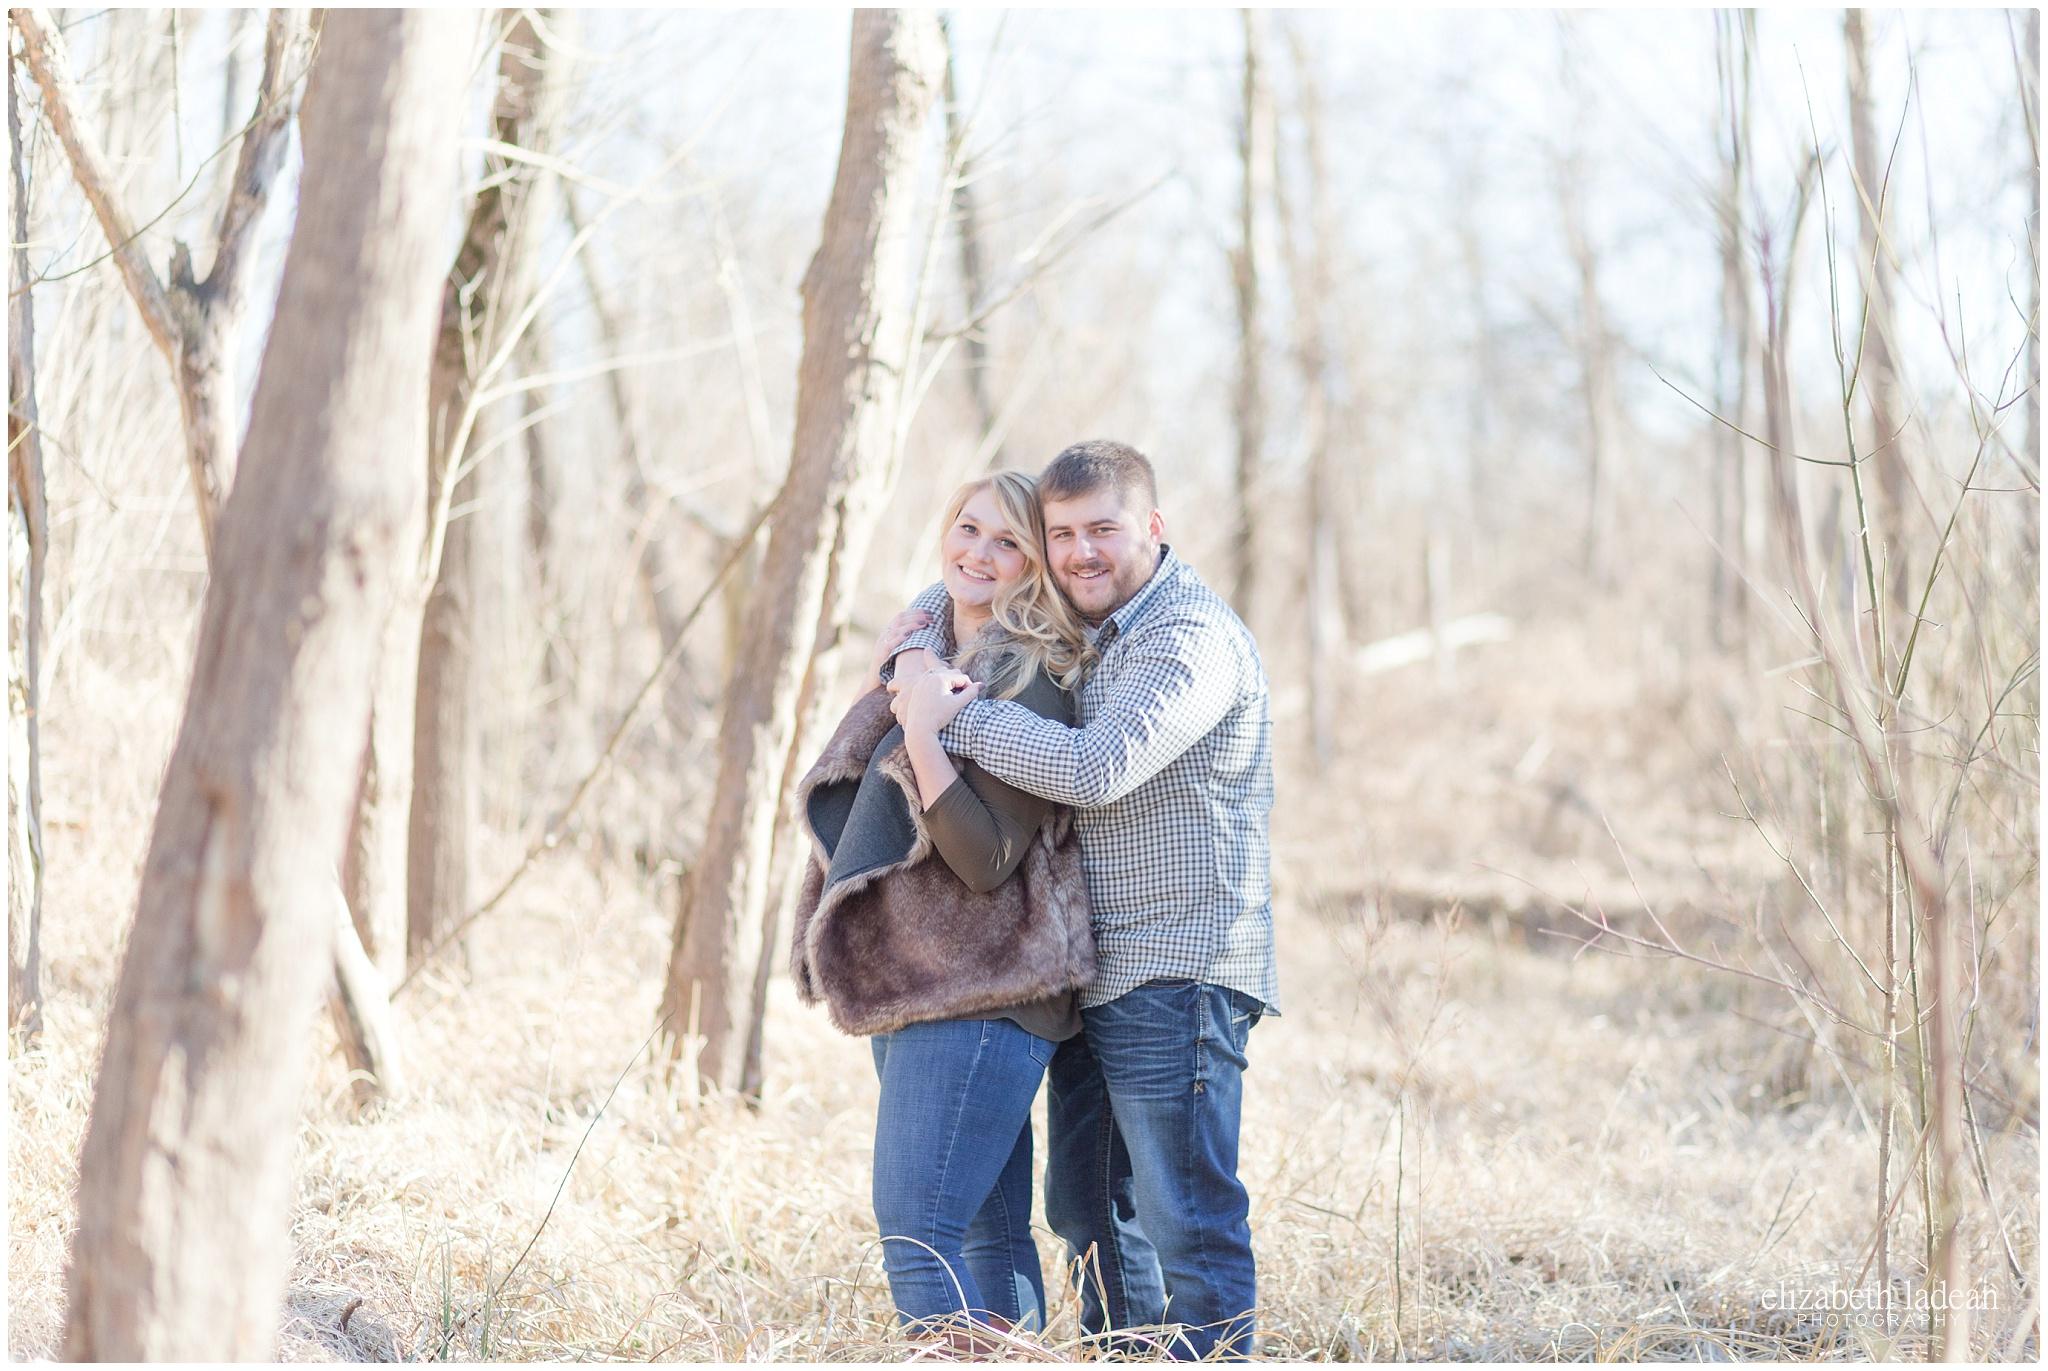 Weston-Bend-State-Park-Engagement-Photos-J+N2017-Elizabeth-Ladean-Photography-photo_0182.jpg